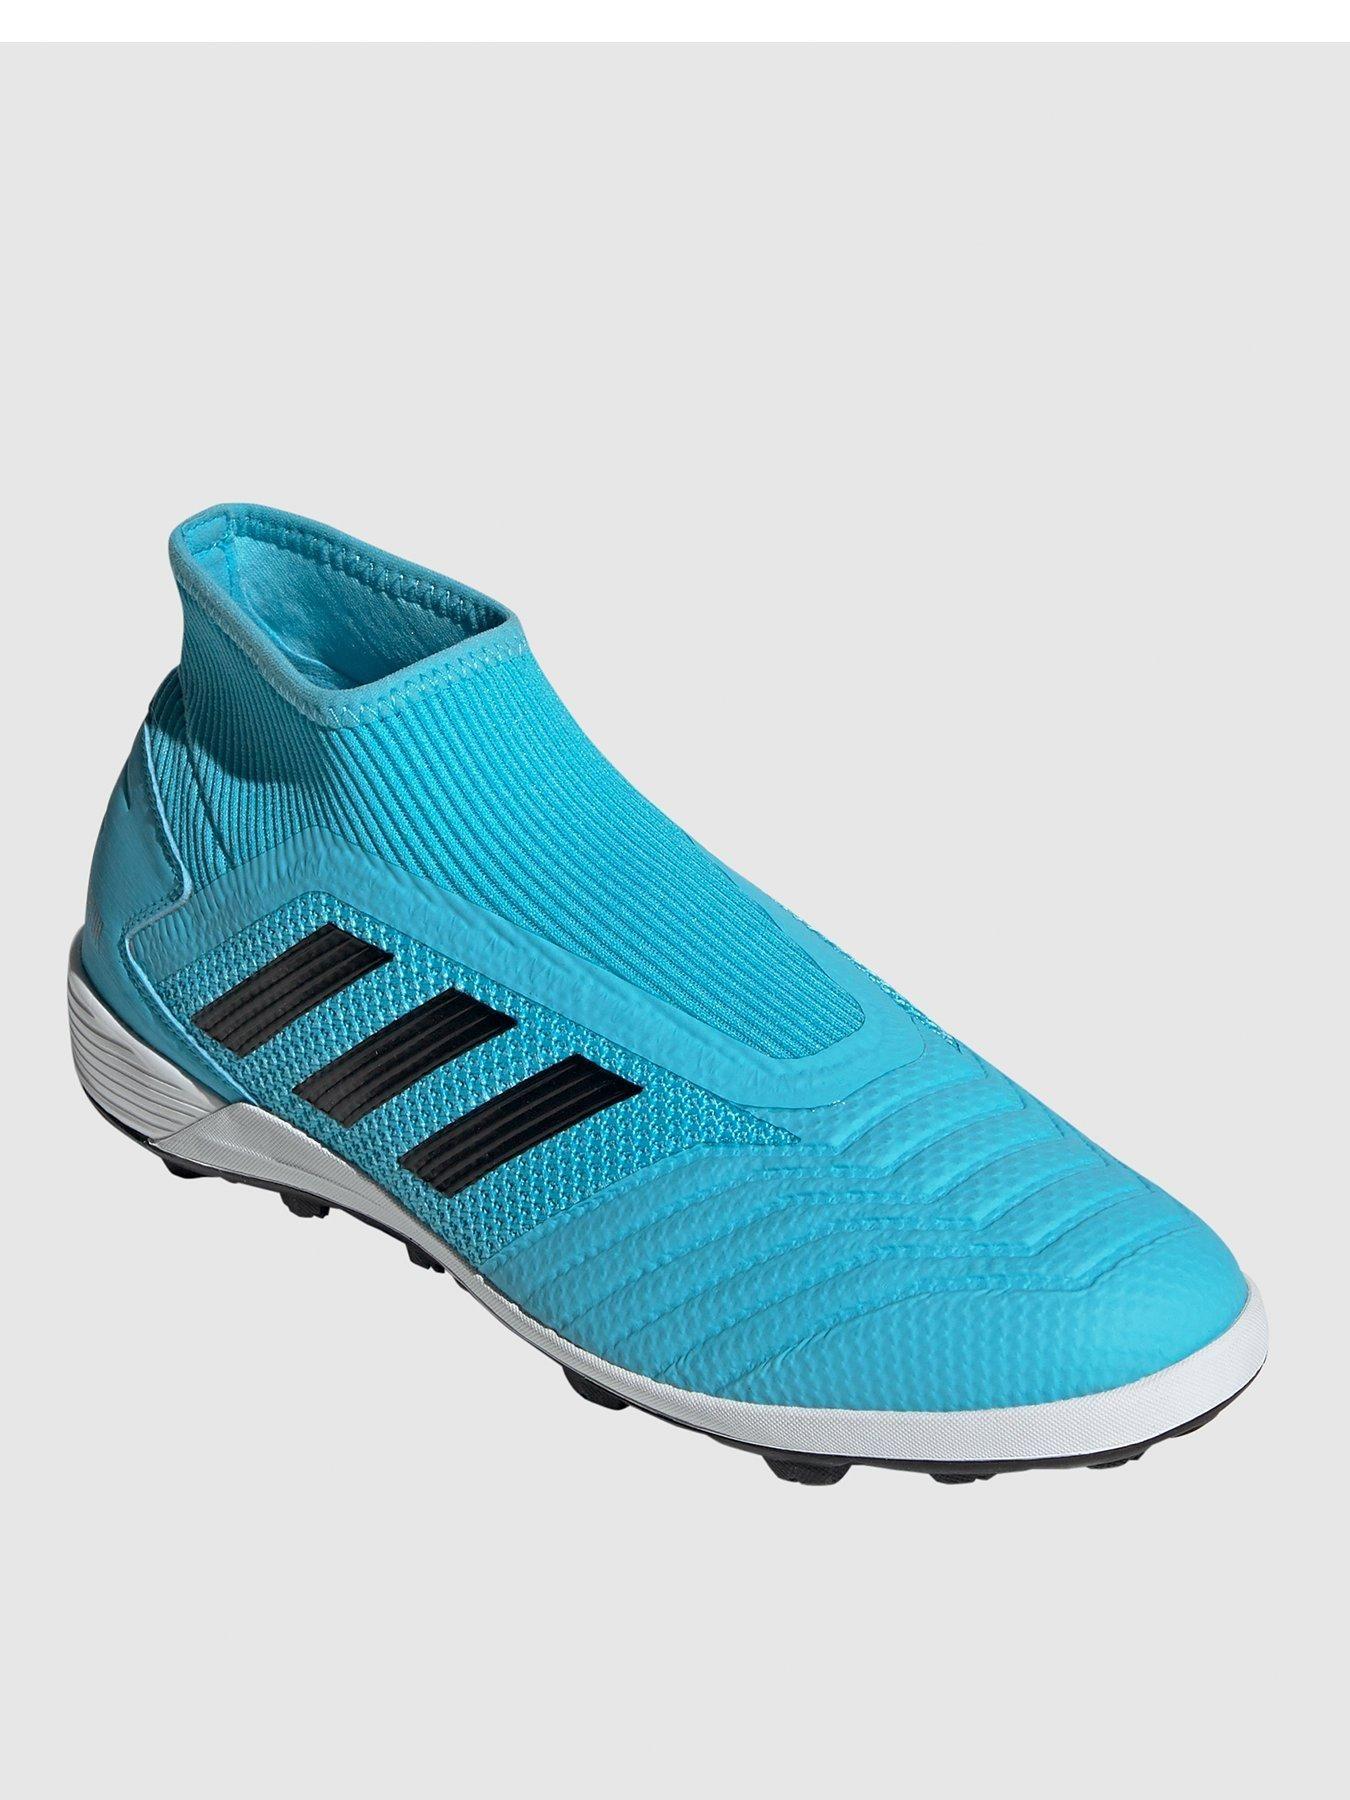 Adidas Predator Laceless 19.3 Astro Turf Football Boot ...